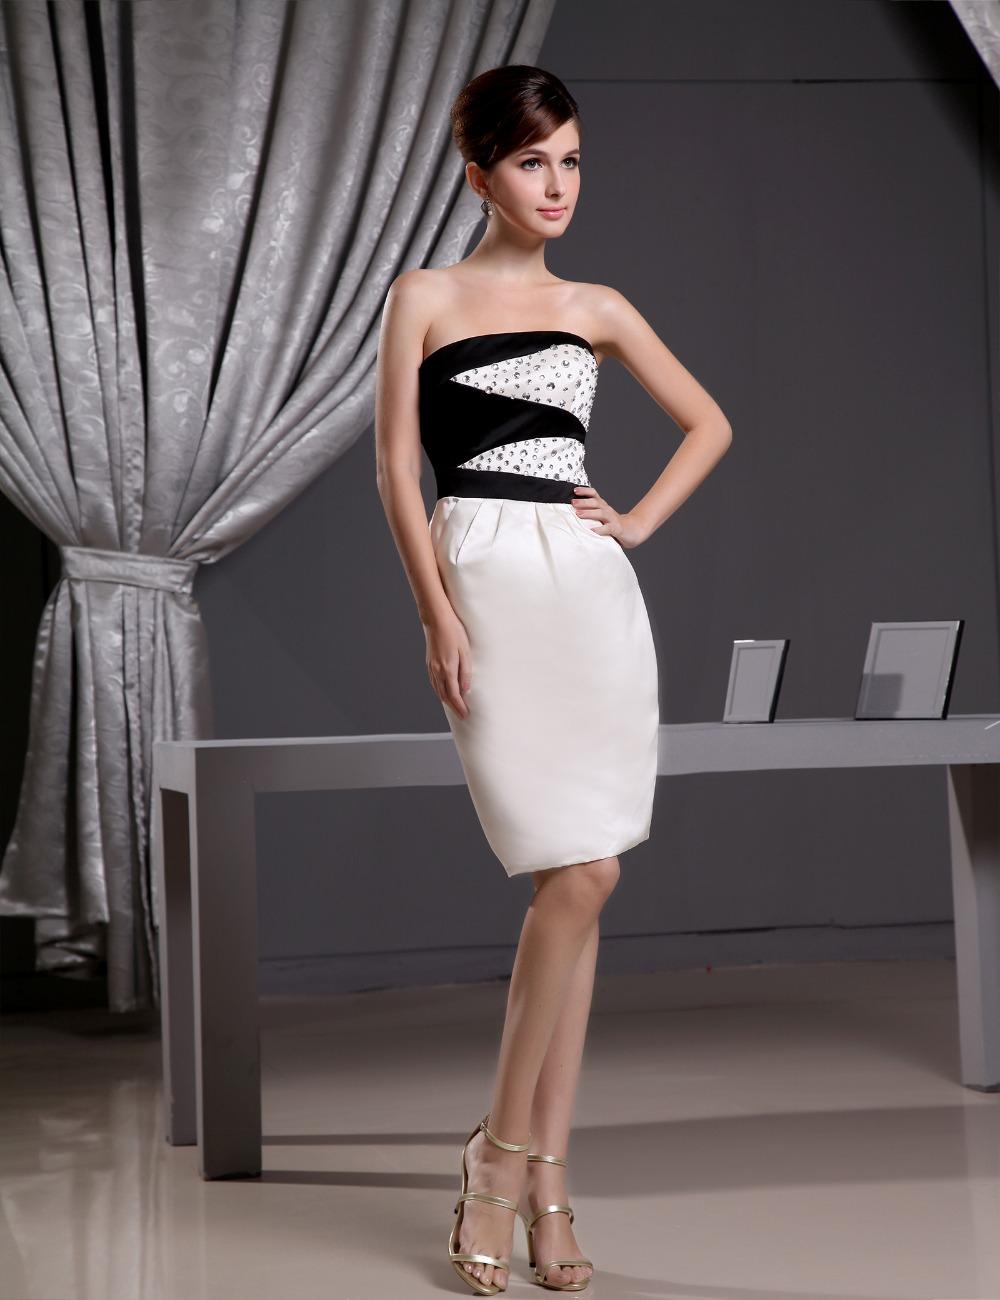 Don's Bridal Coctail Dress 2016 Custom Made Satin Knee Length Crystal Sleeveless Sexy Cocktail Dresses(China (Mainland))